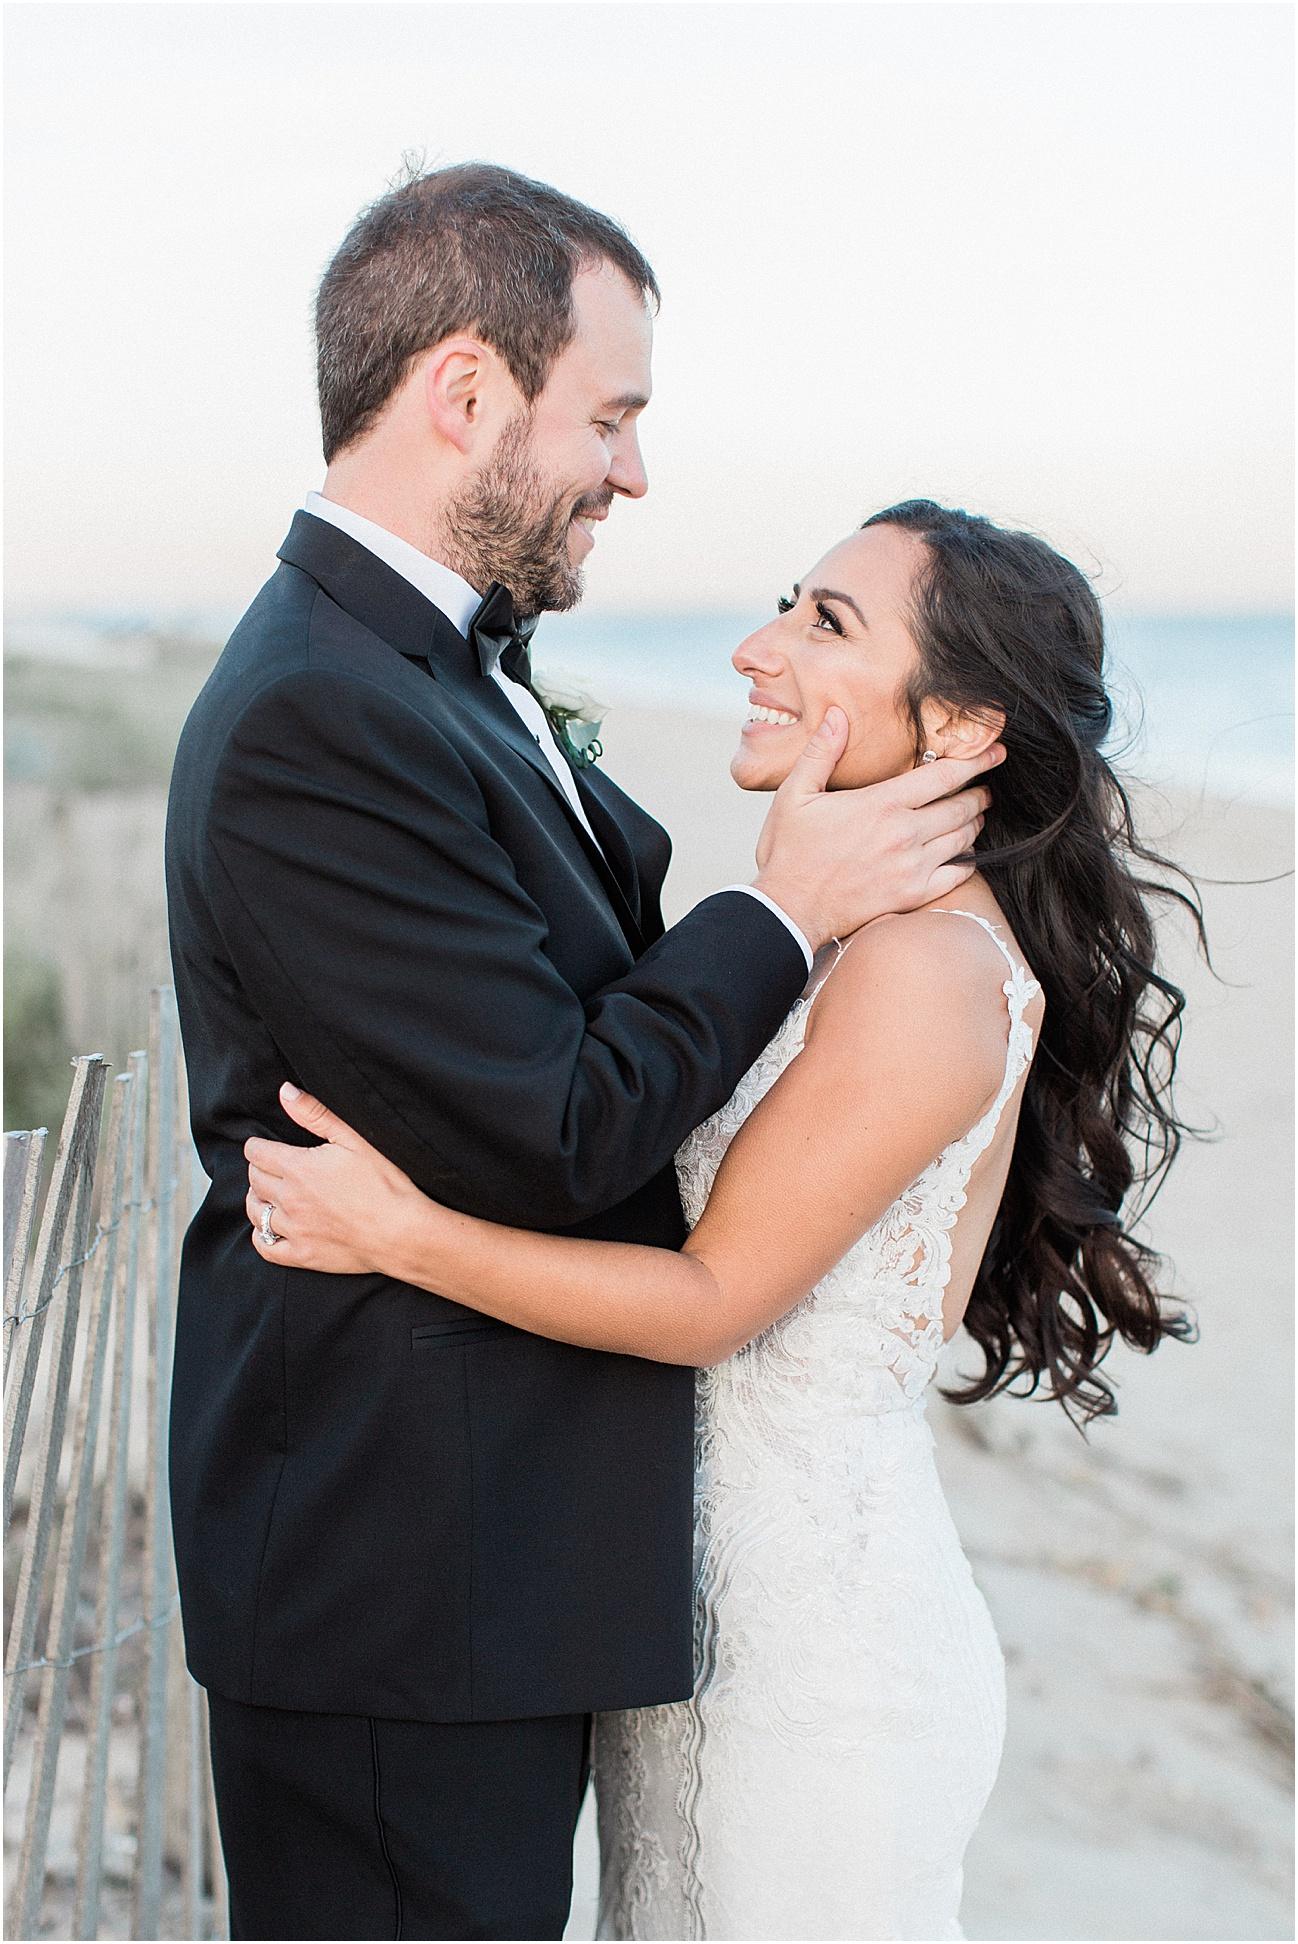 michelle_matt_popponesset_inn_celebrations_new_seabury_fall_cape_cod_boston_wedding_photographer_meredith_jane_photography_photo_1590.jpg